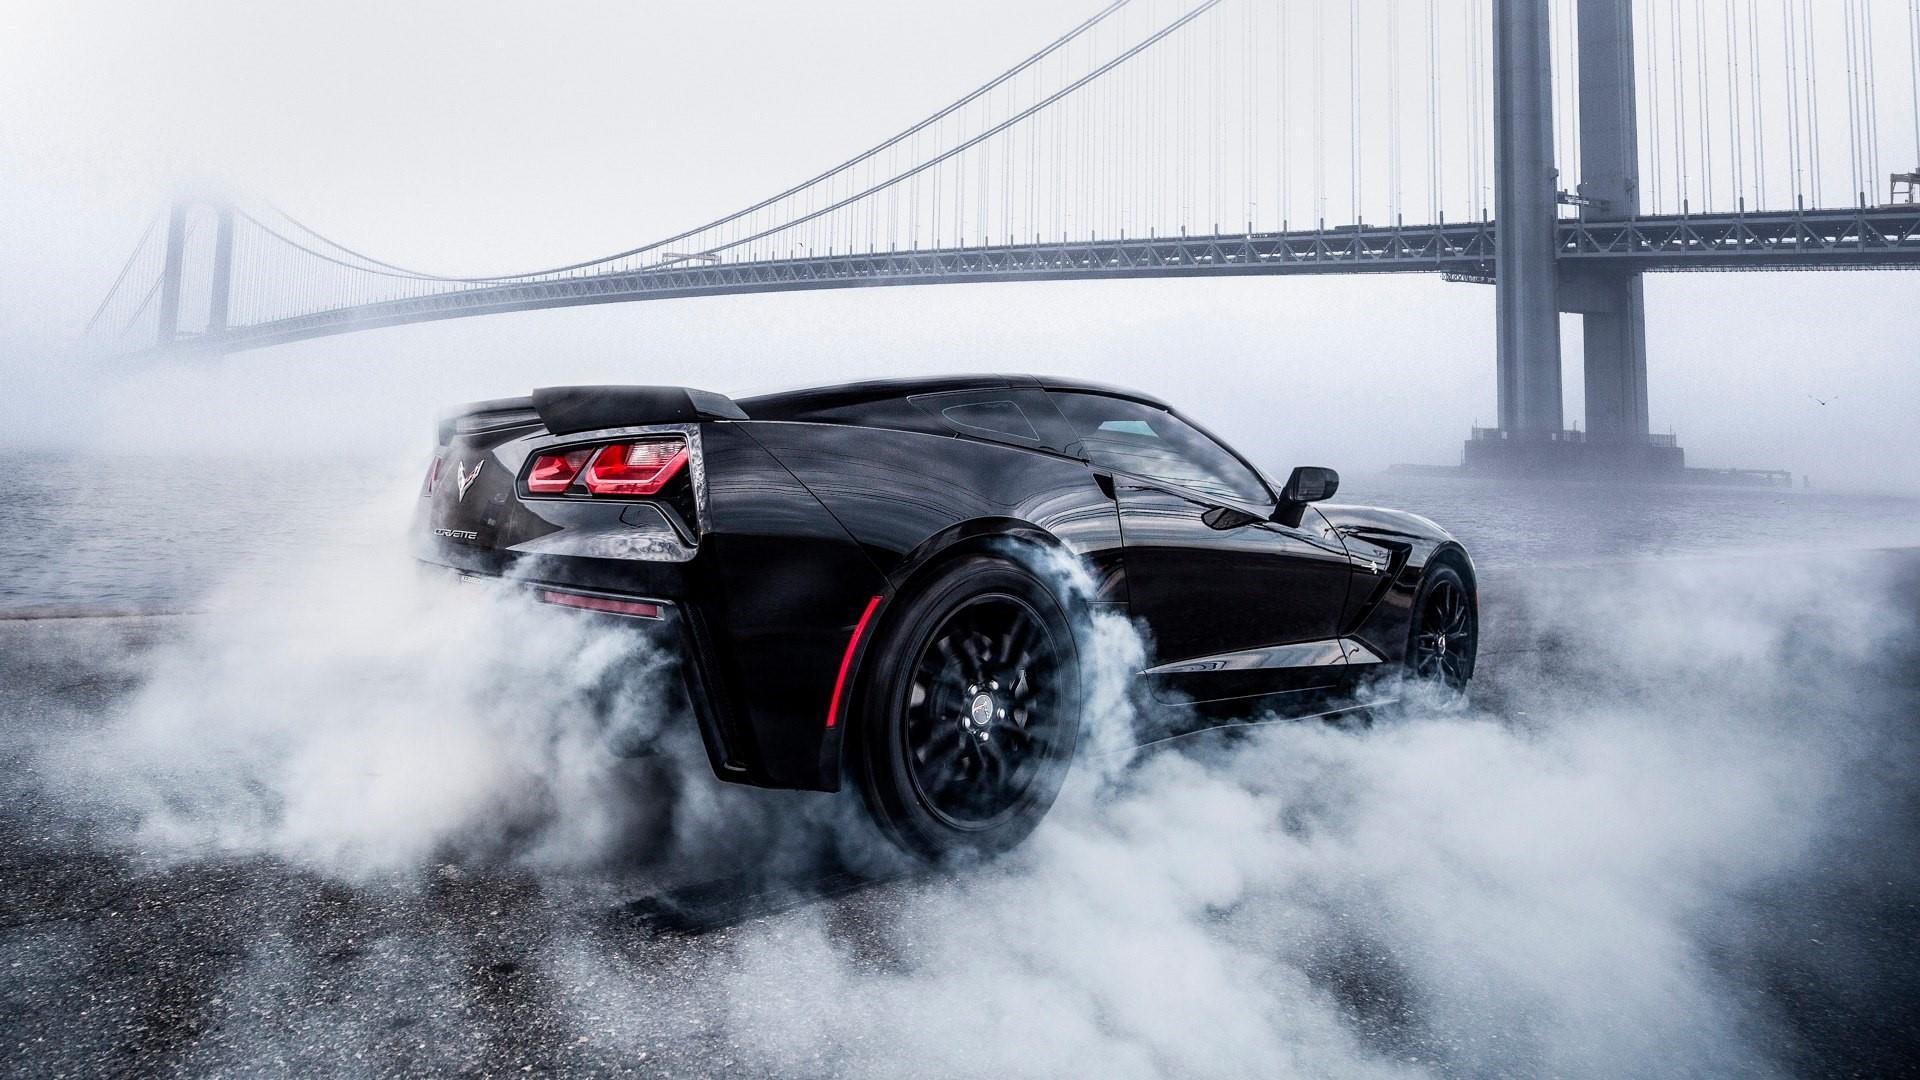 Corvette Wallpapers   Top Corvette Backgrounds   WallpaperAccess 1920x1080